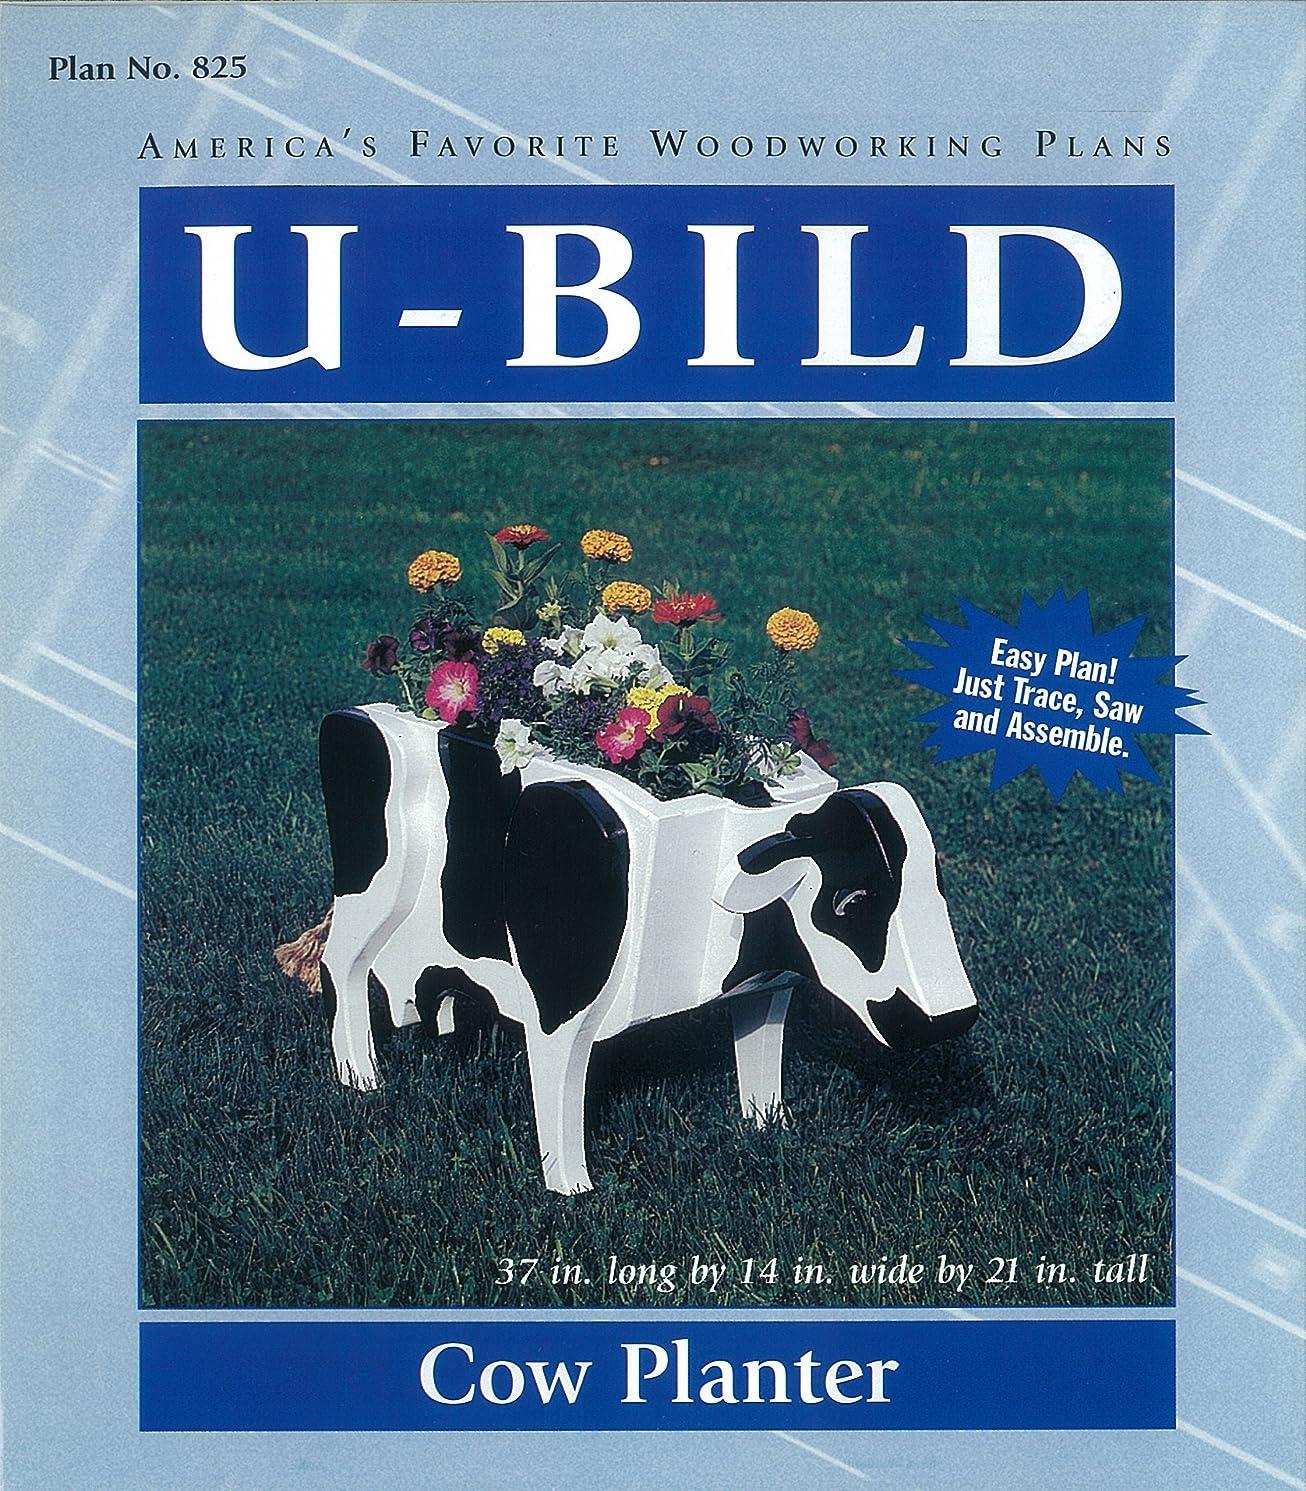 U-Bild 825 Cow Planter Project Plan